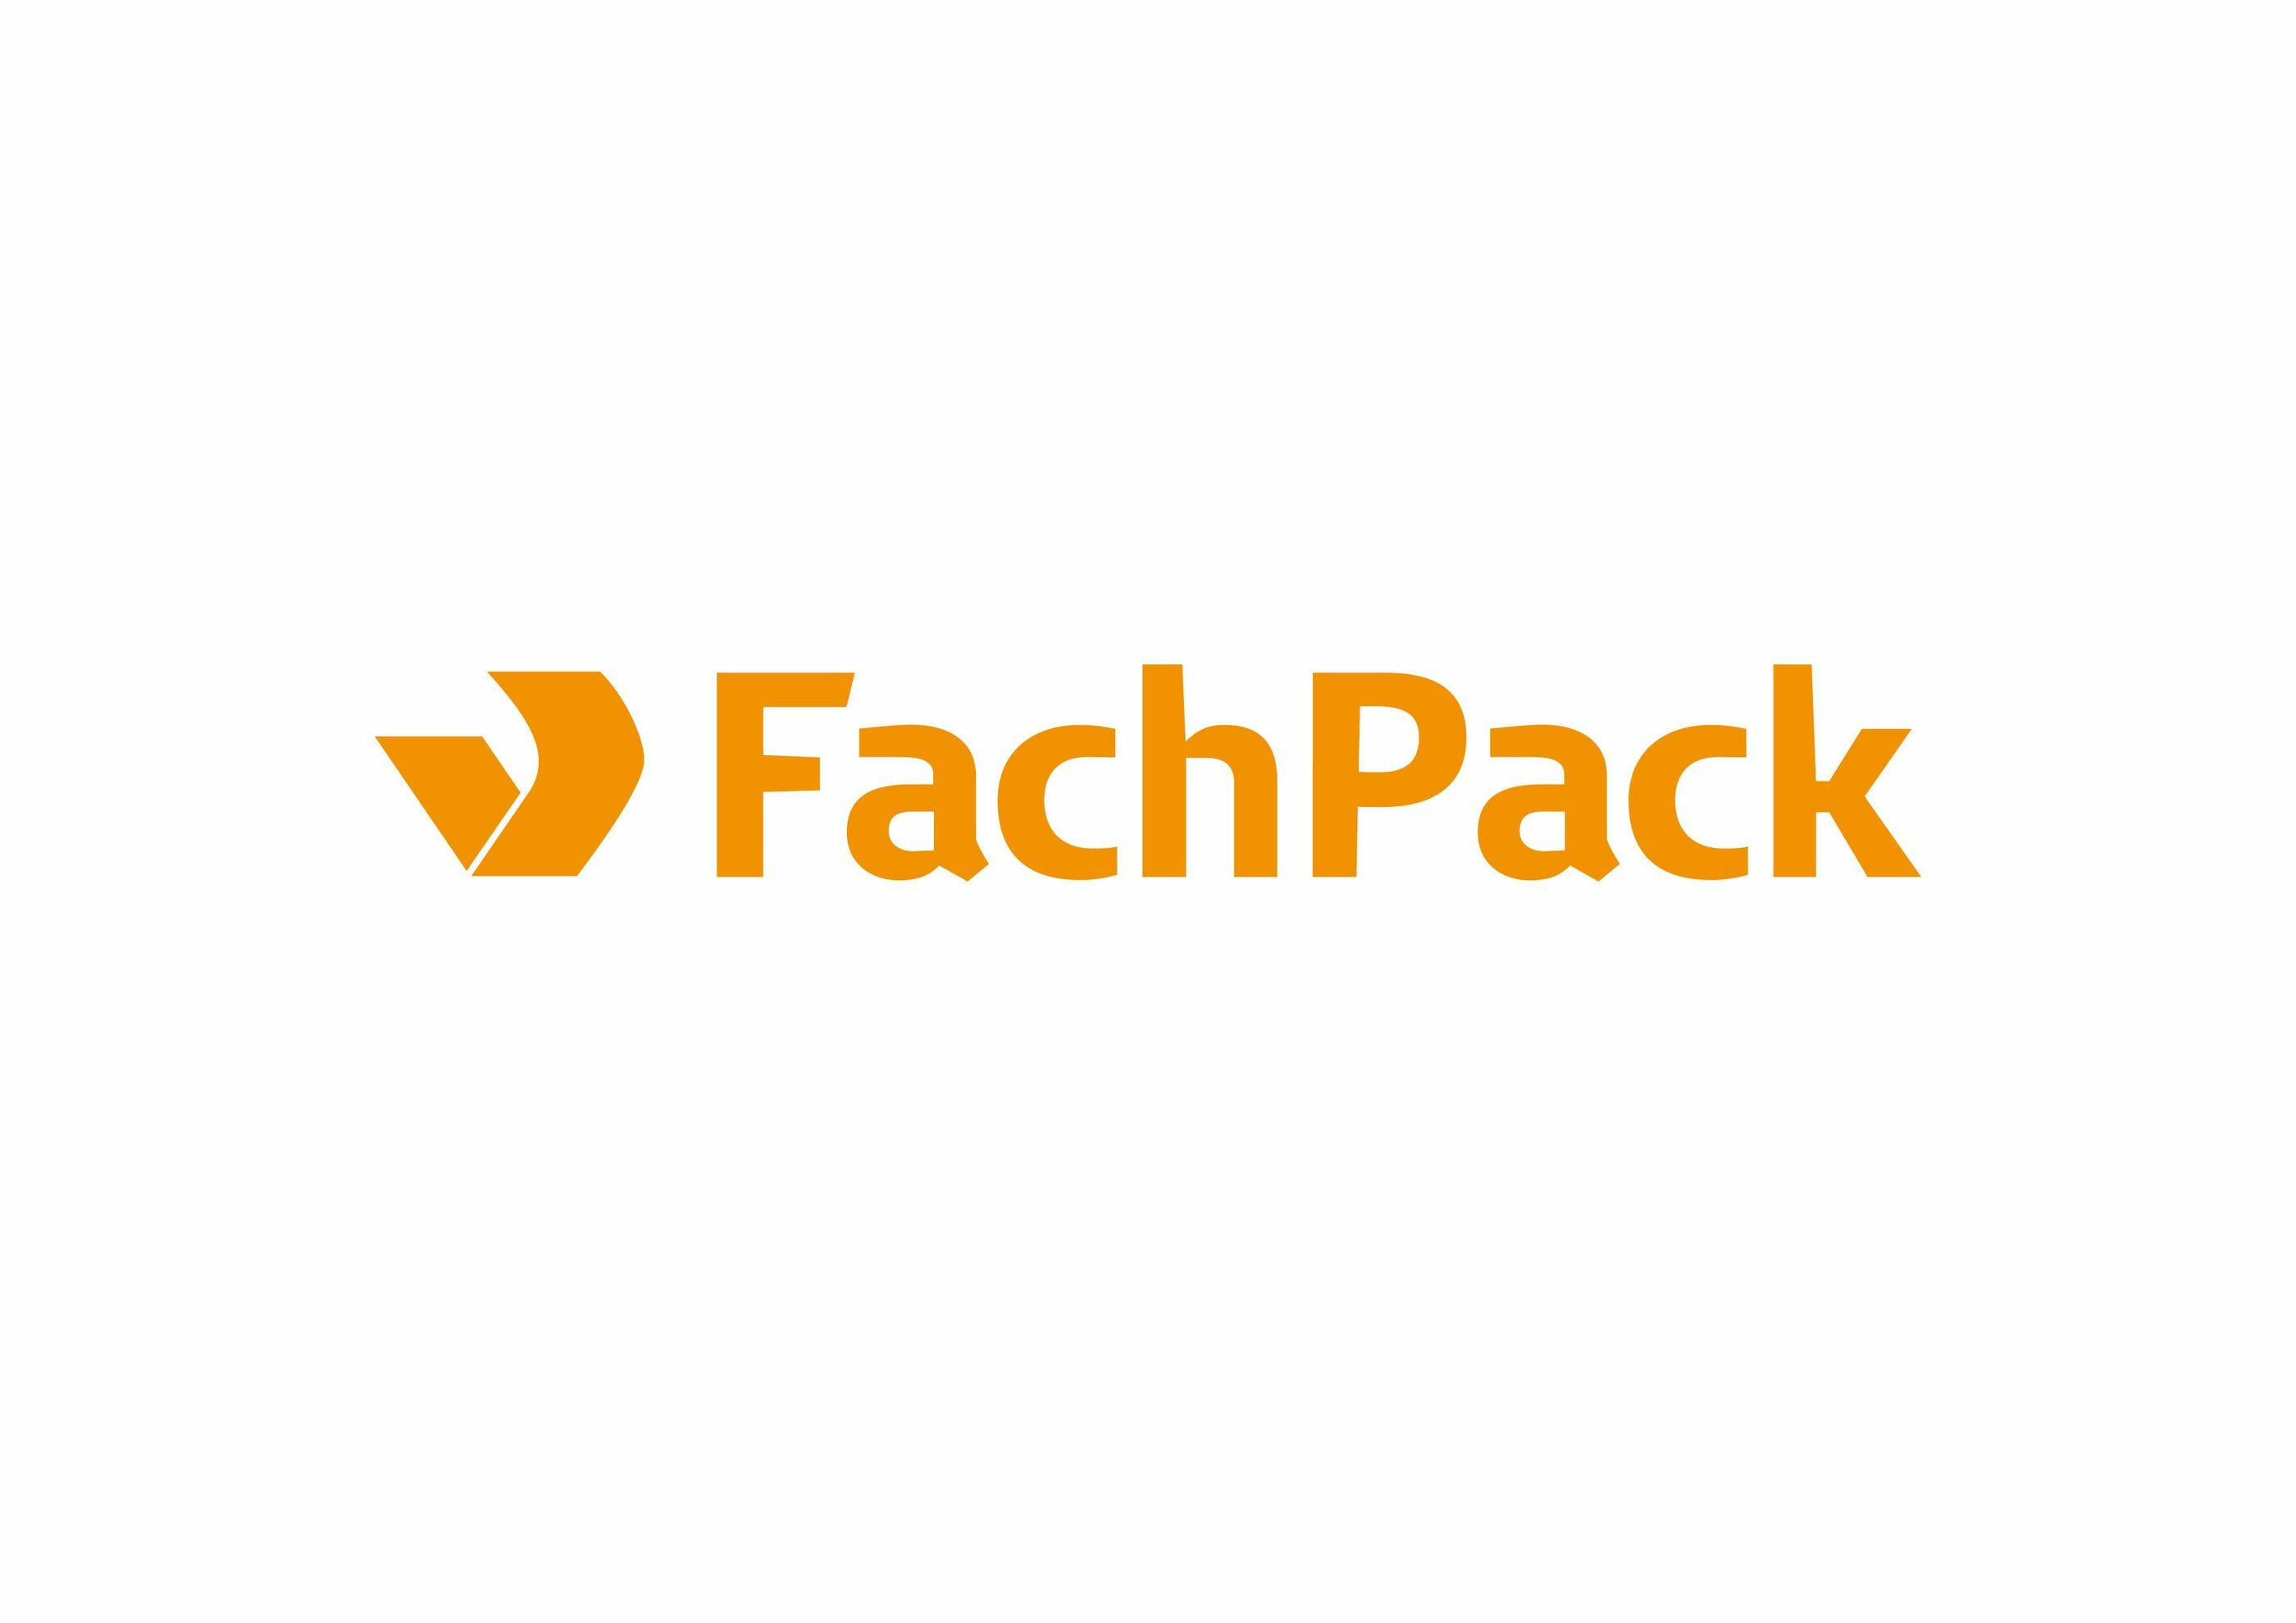 fachpack-2018-logo-300dpi-rgb